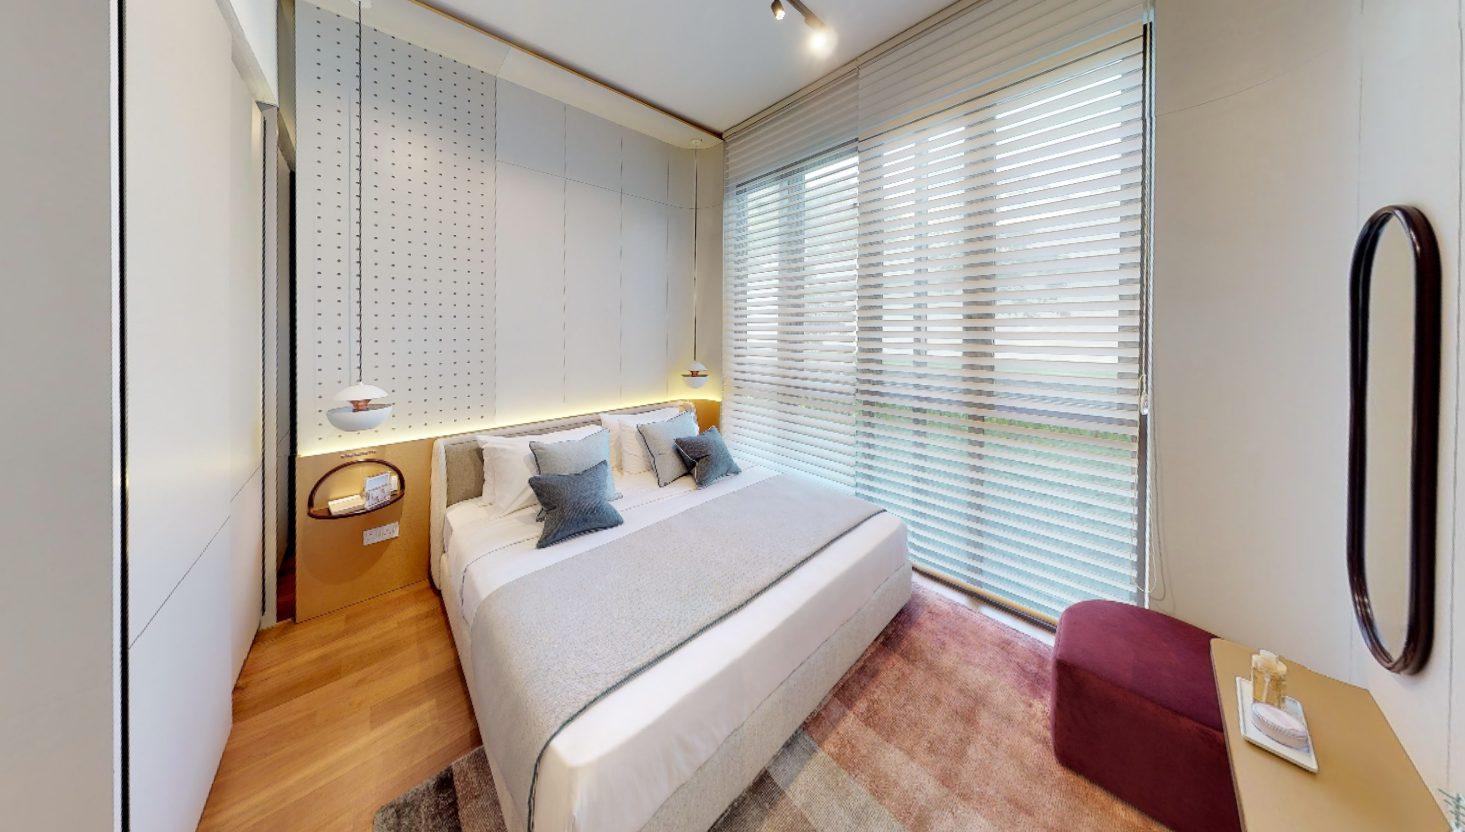 parksuites condo showflat master bedroom